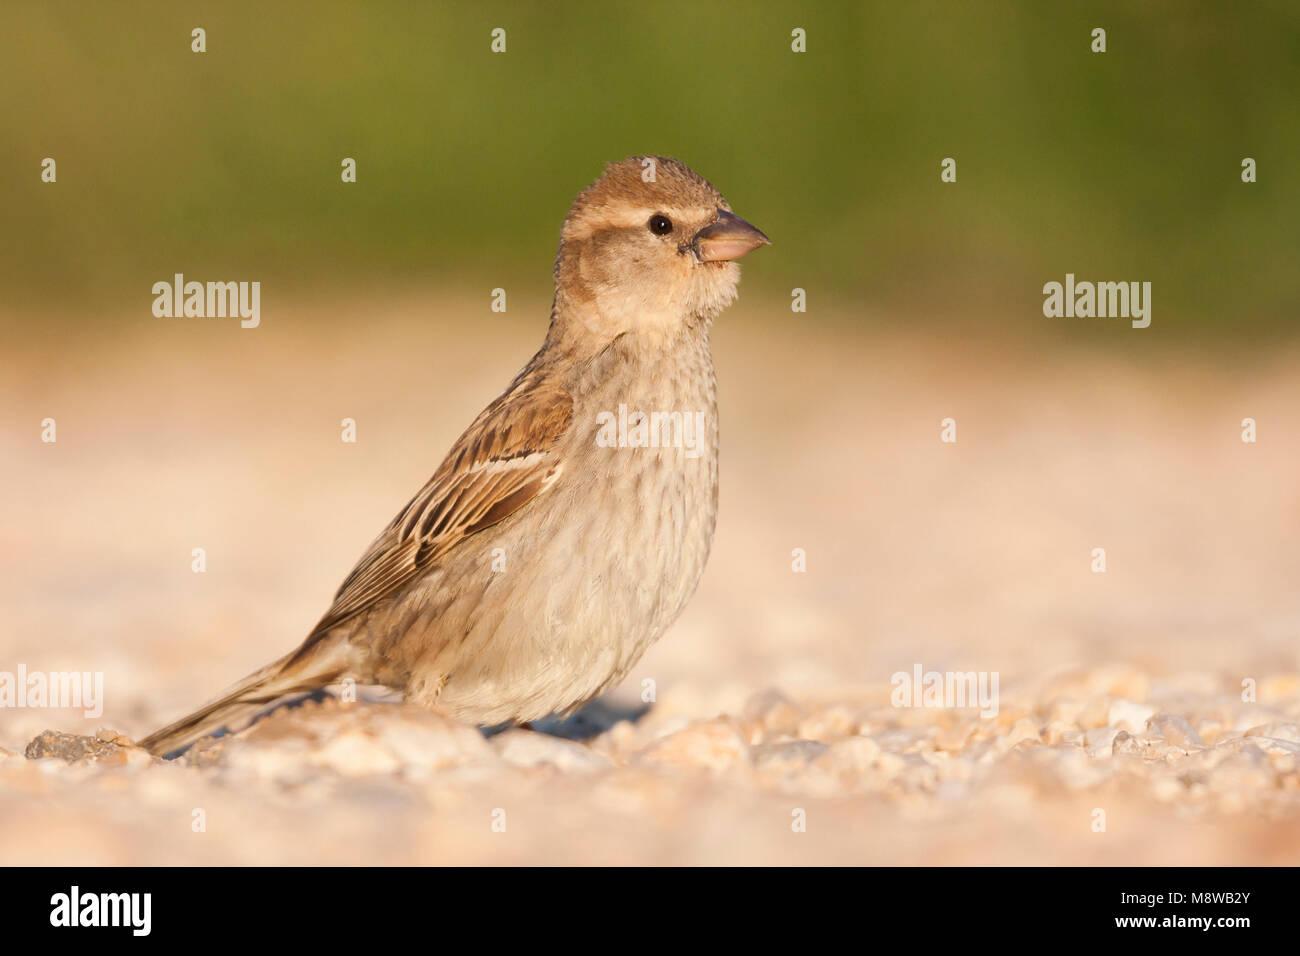 Spanish Sparrow - Weidensperling - Passer hispaniolensis ssp. hispaniolensis, adult female, Croatia Stock Photo